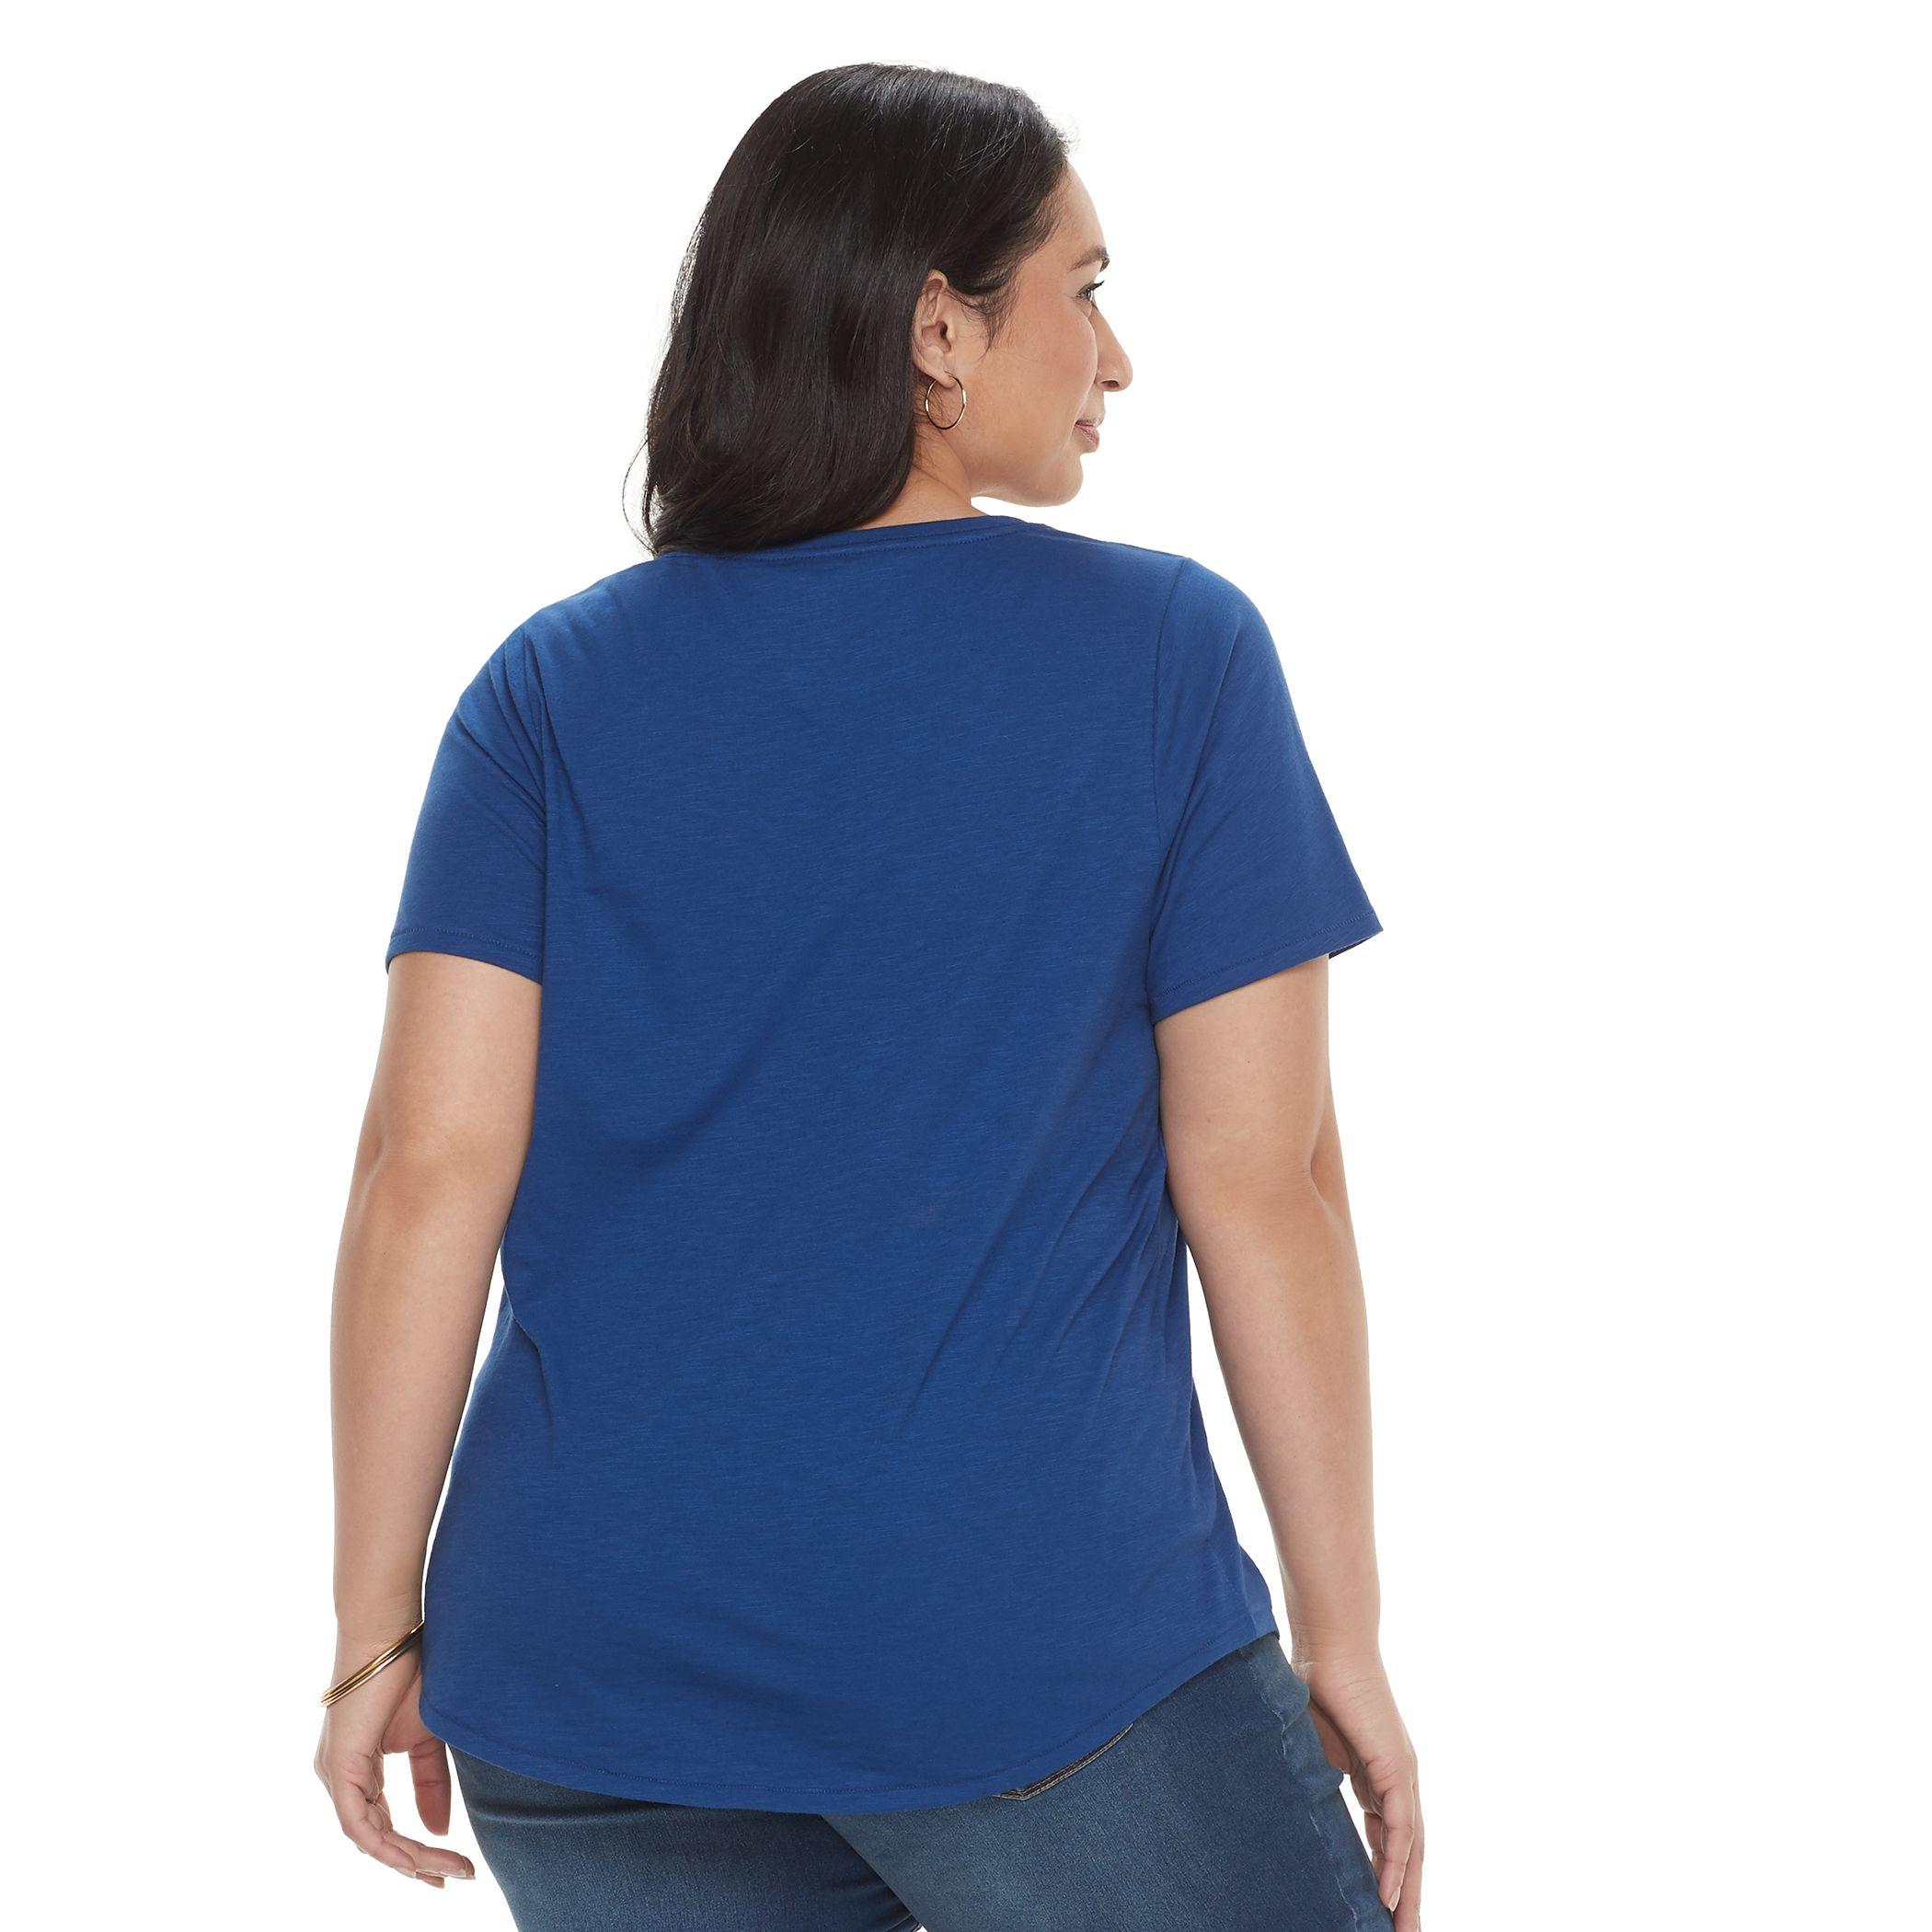 f1de9b4da0a3 Kohls Sonoma Womens Tee Shirts